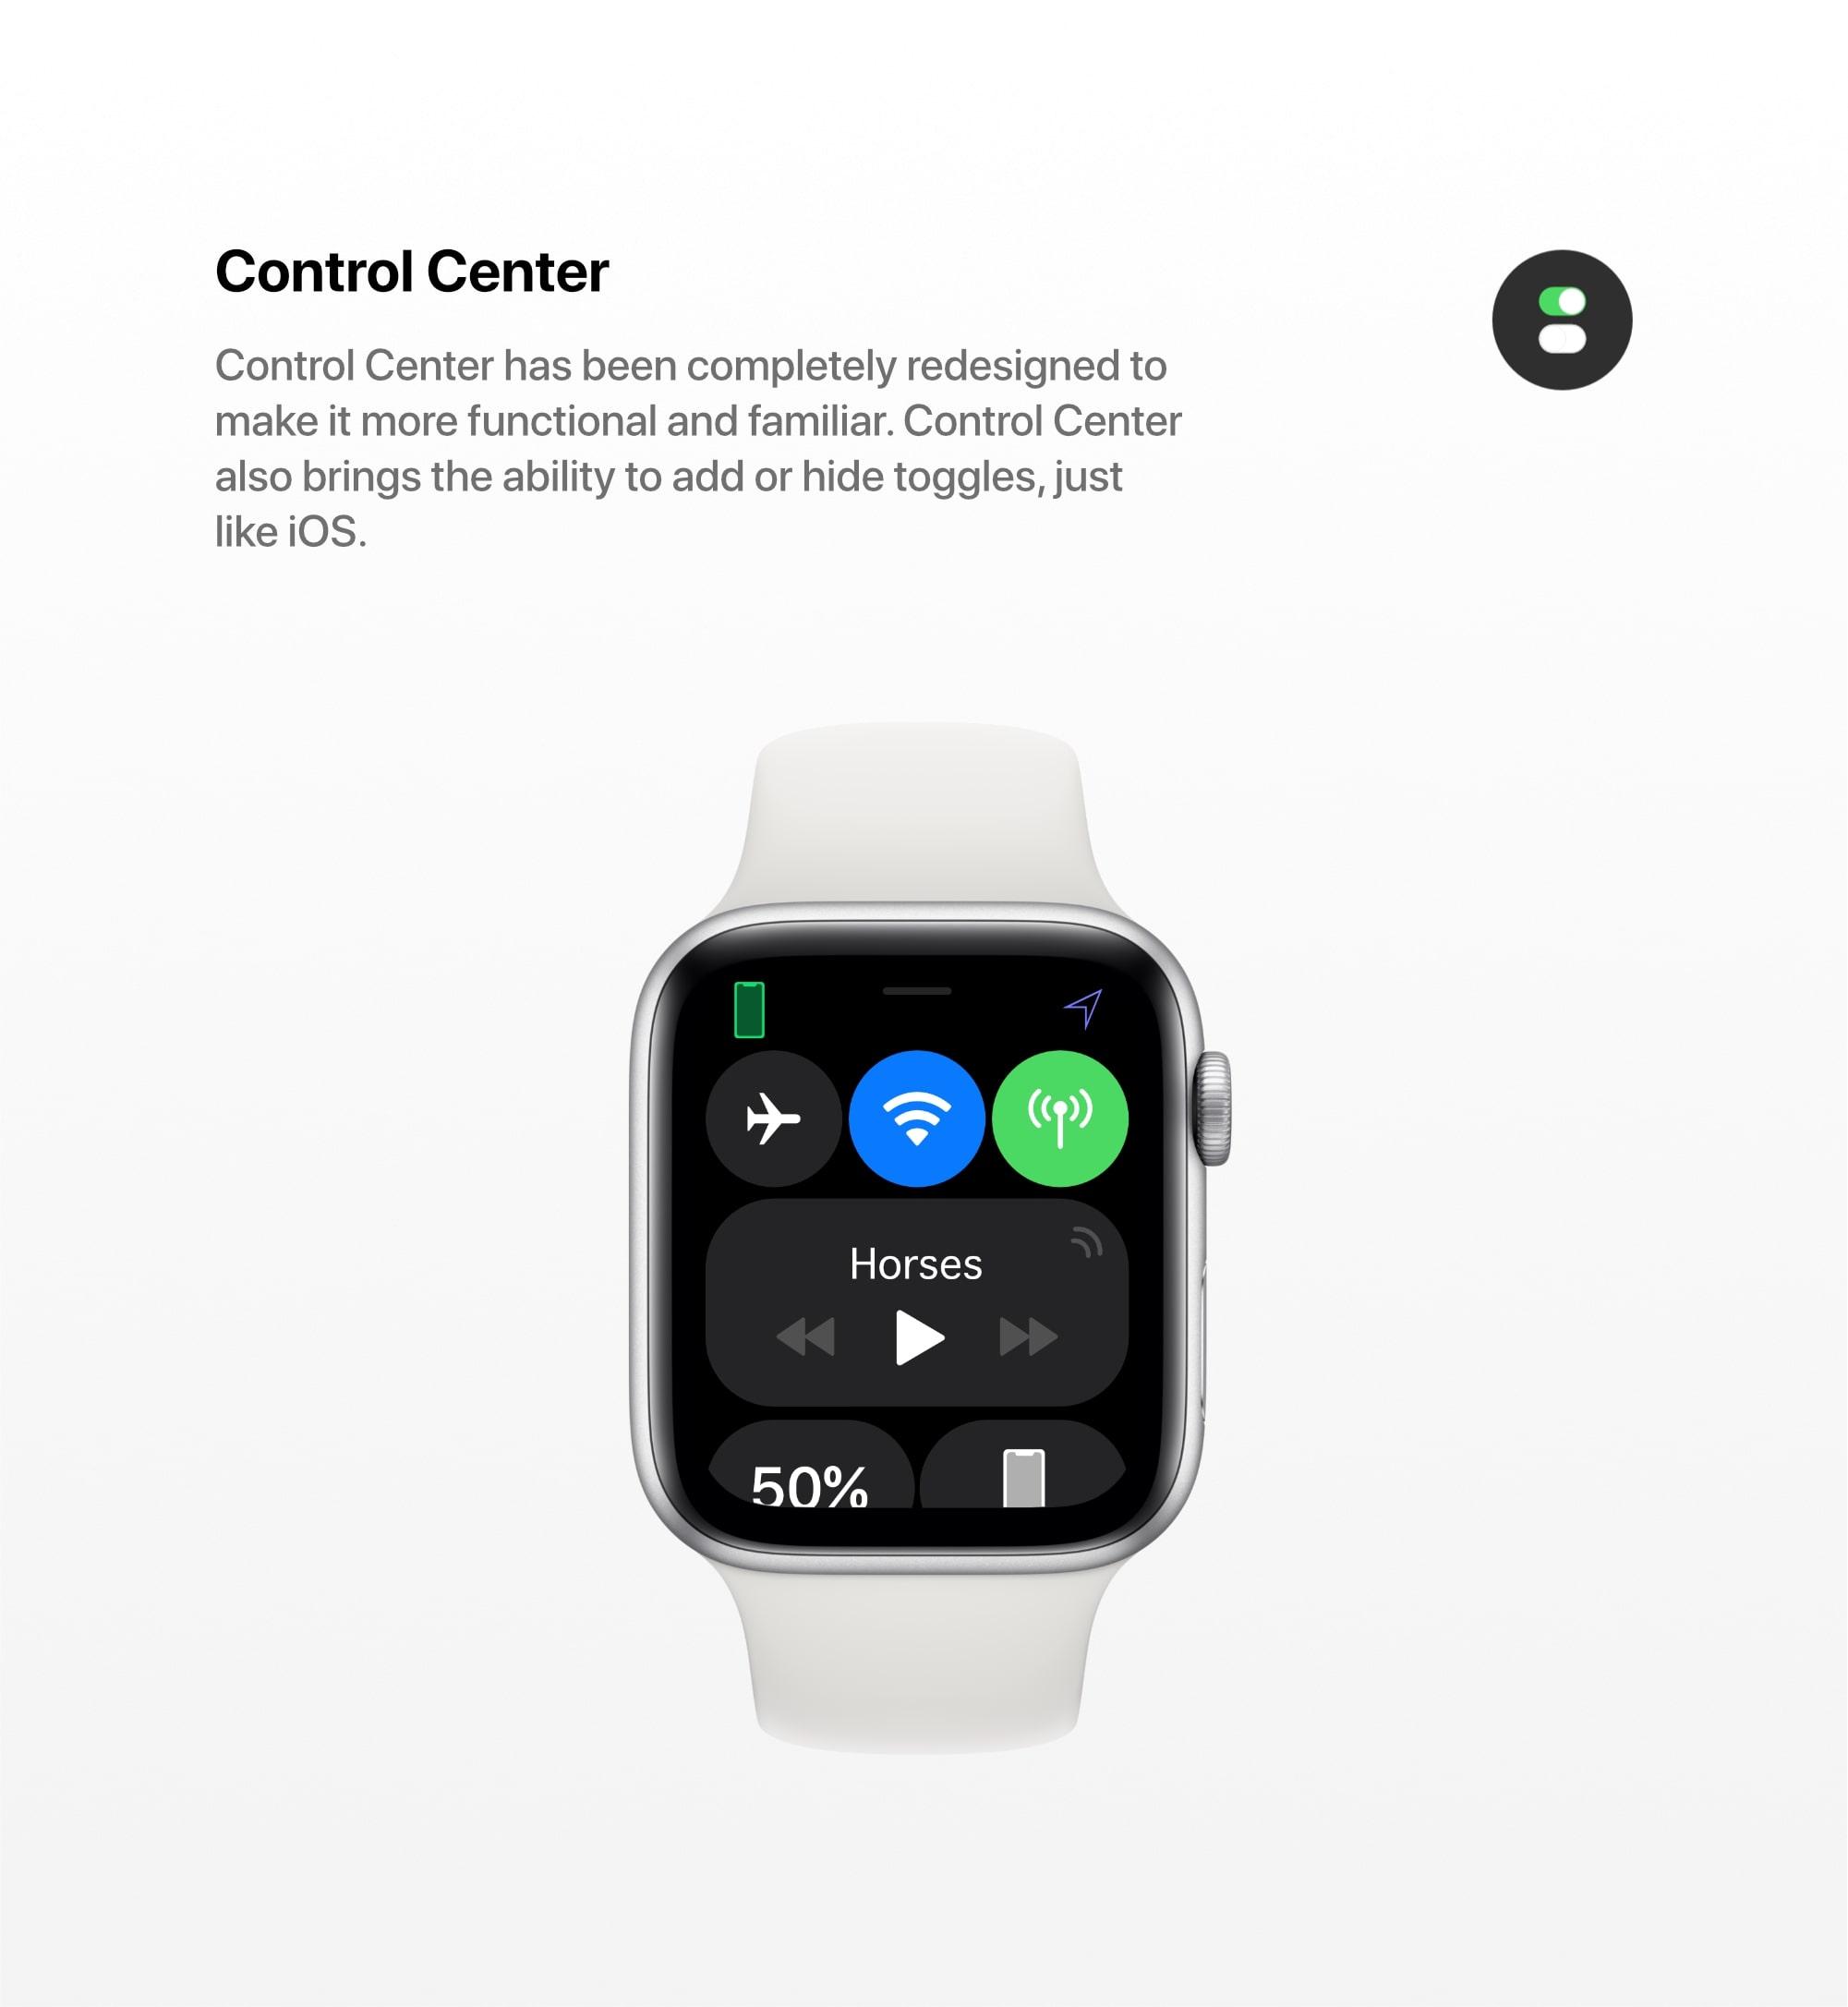 Apple Watch Watch Os 6 Concept 24